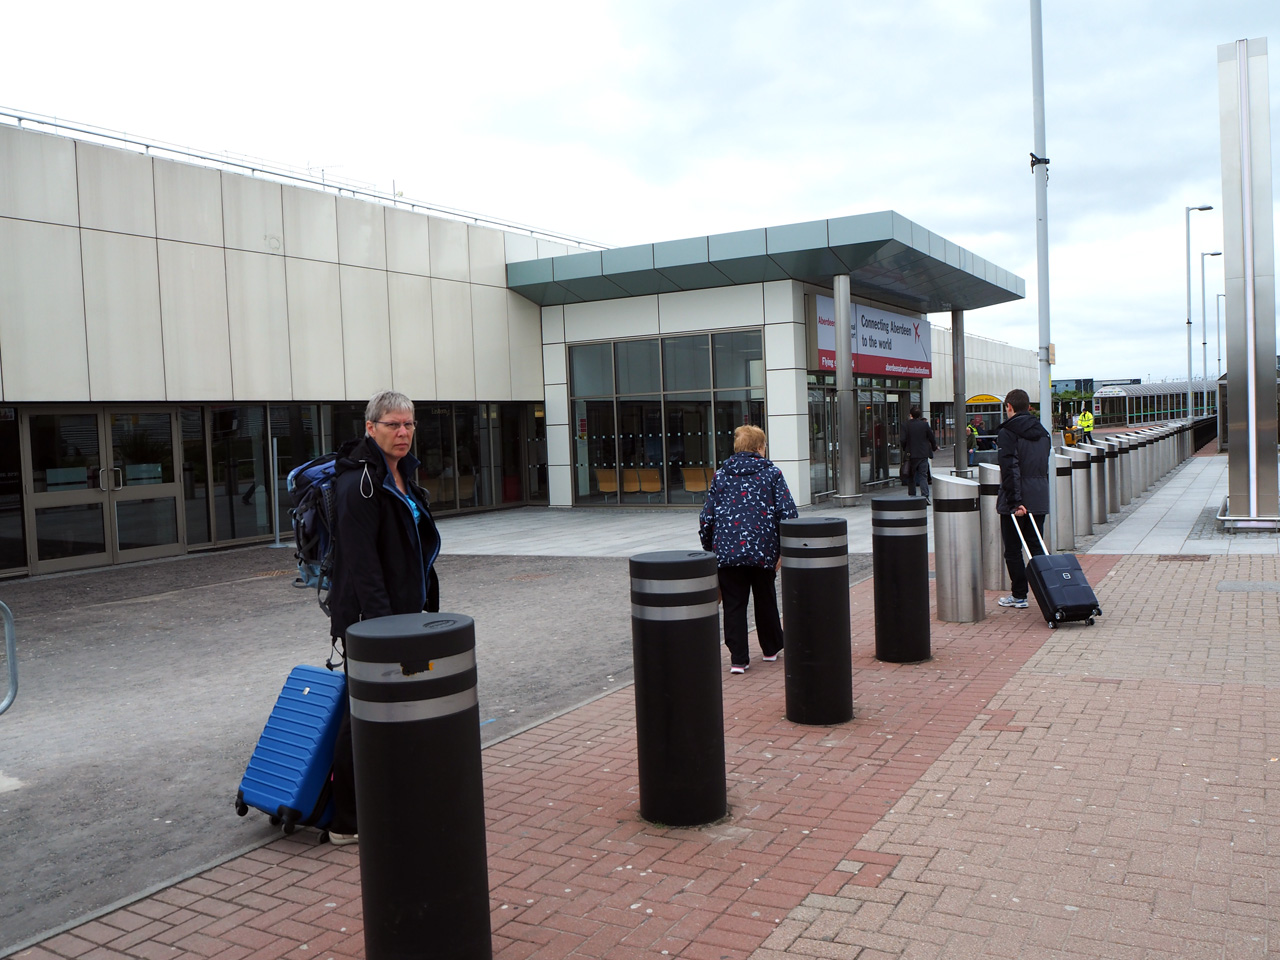 centrale ingang Aberdeen Airport